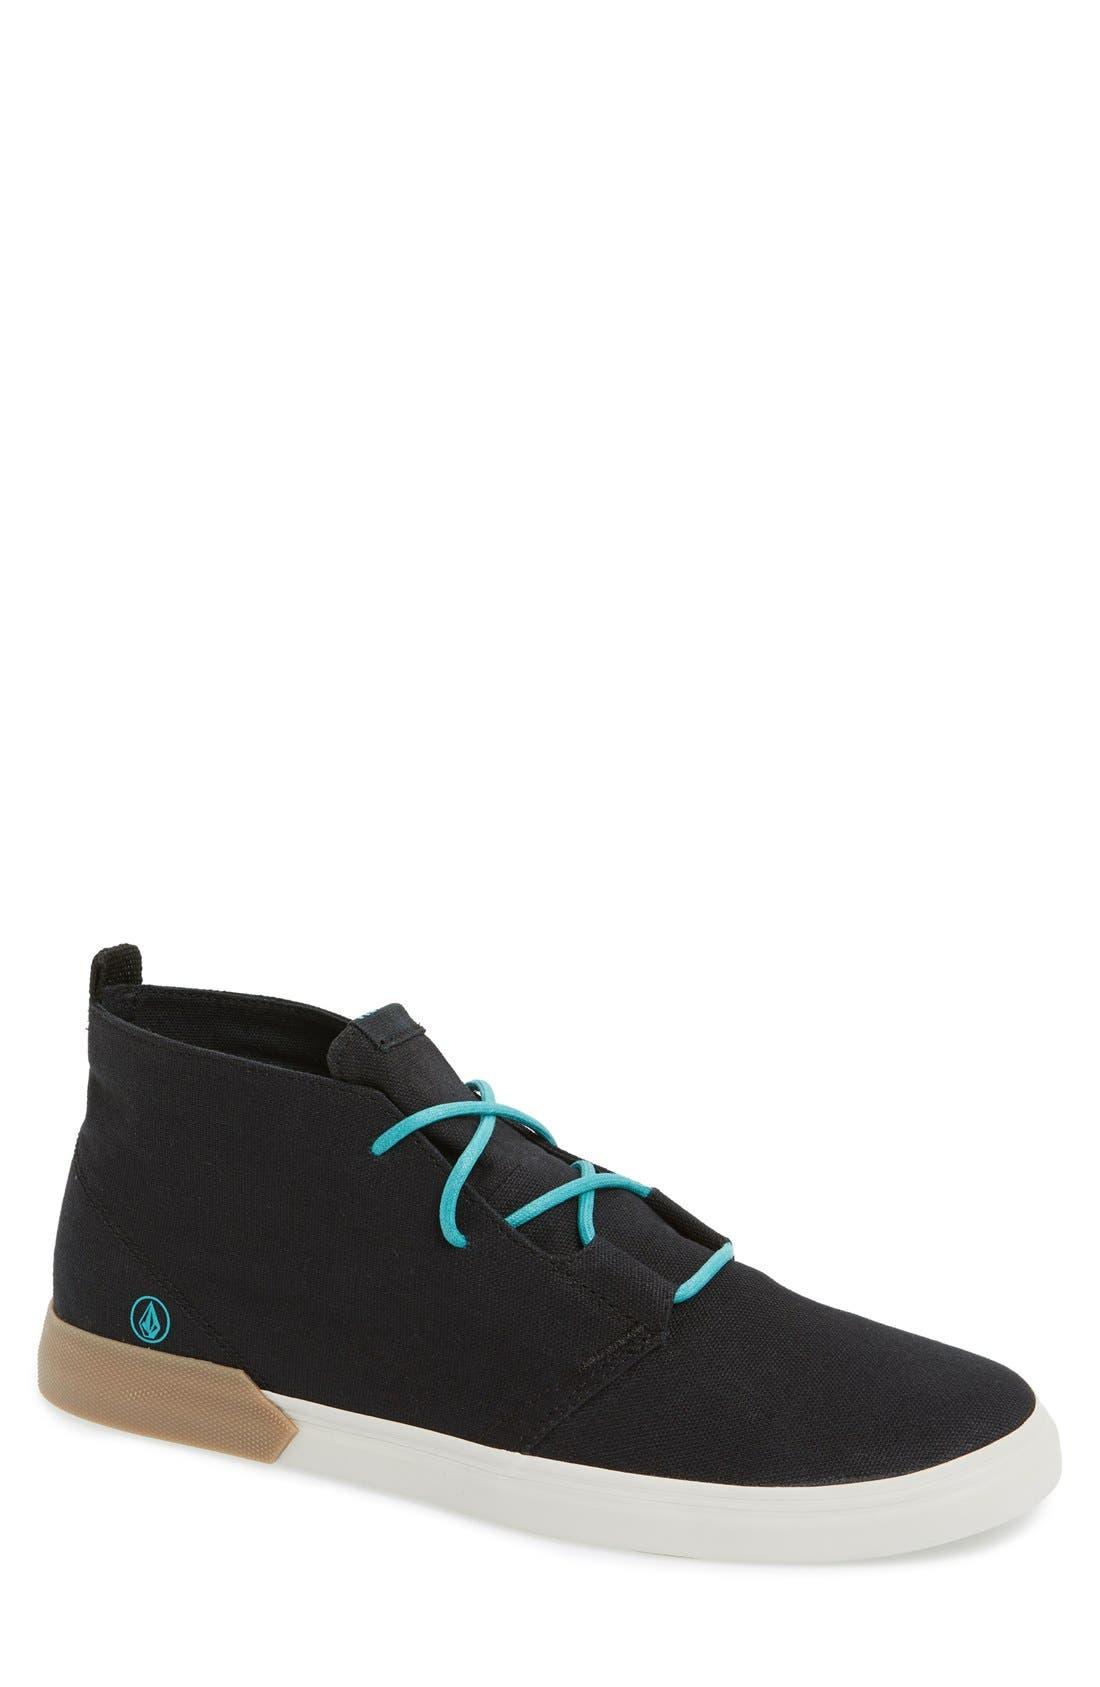 Main Image - Volcom 'De Fray' High Top Sneaker